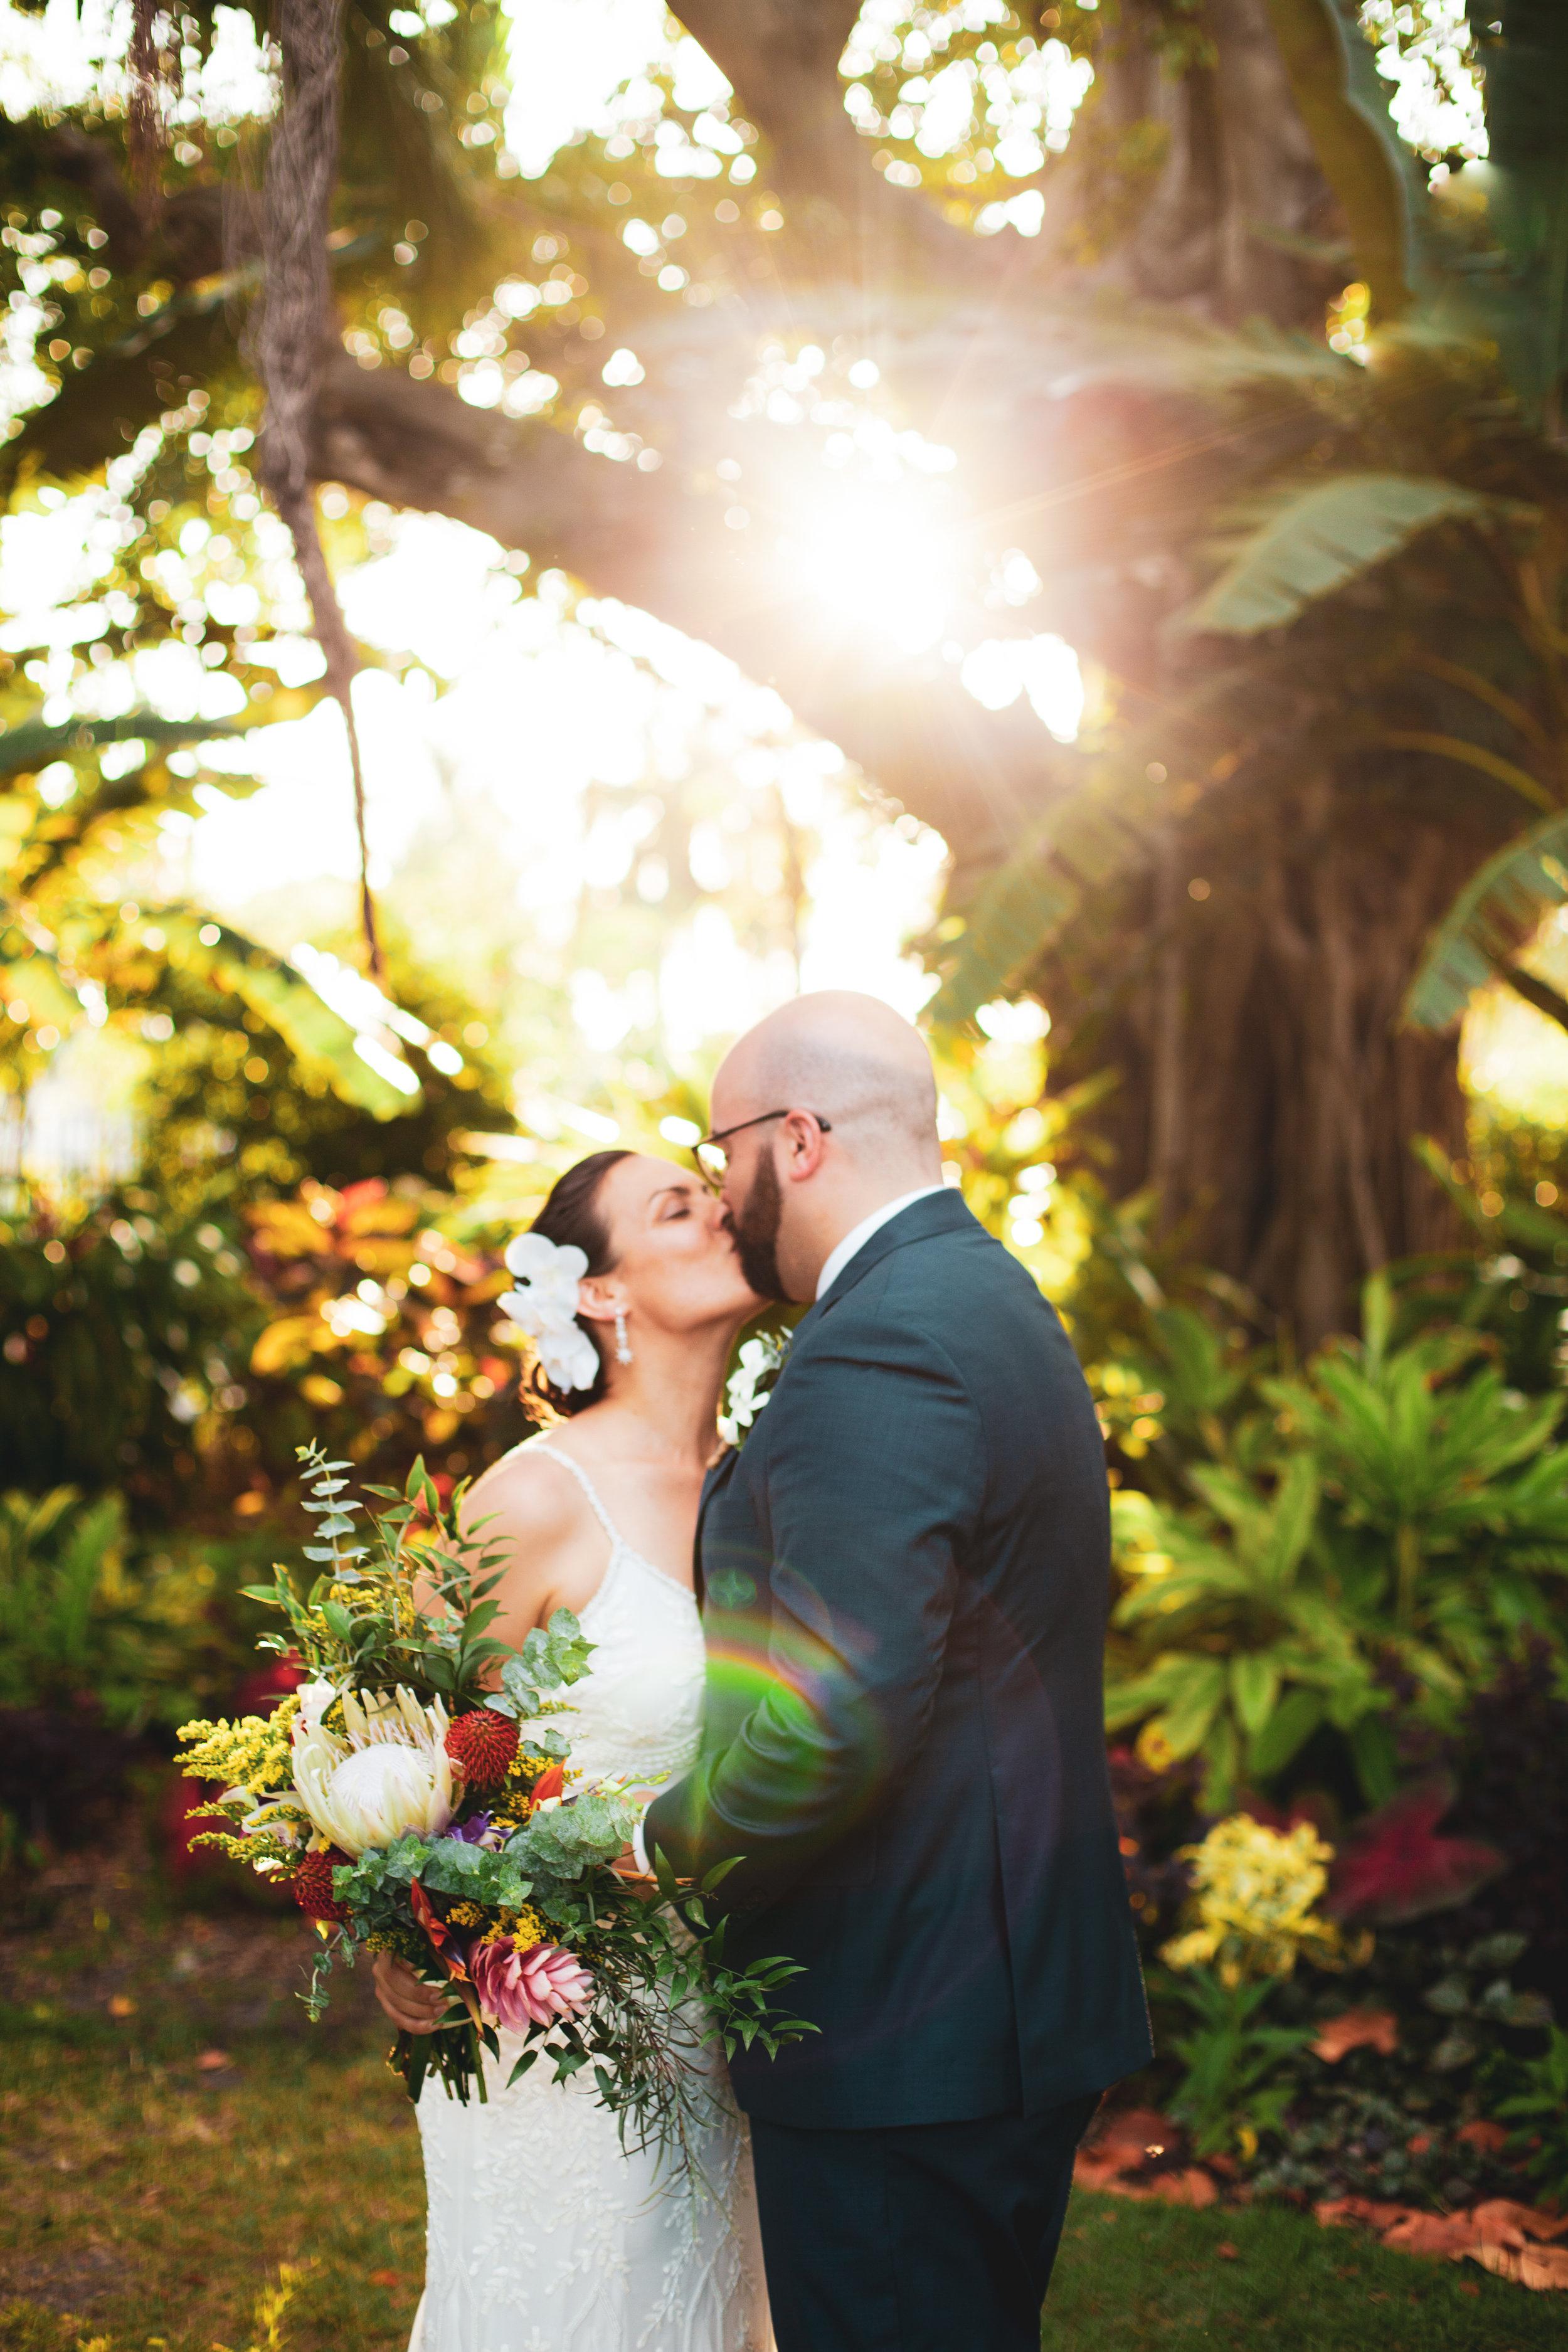 miami beach botanical garden florida wedding © kelilina photography 20190601132142-5.jpg